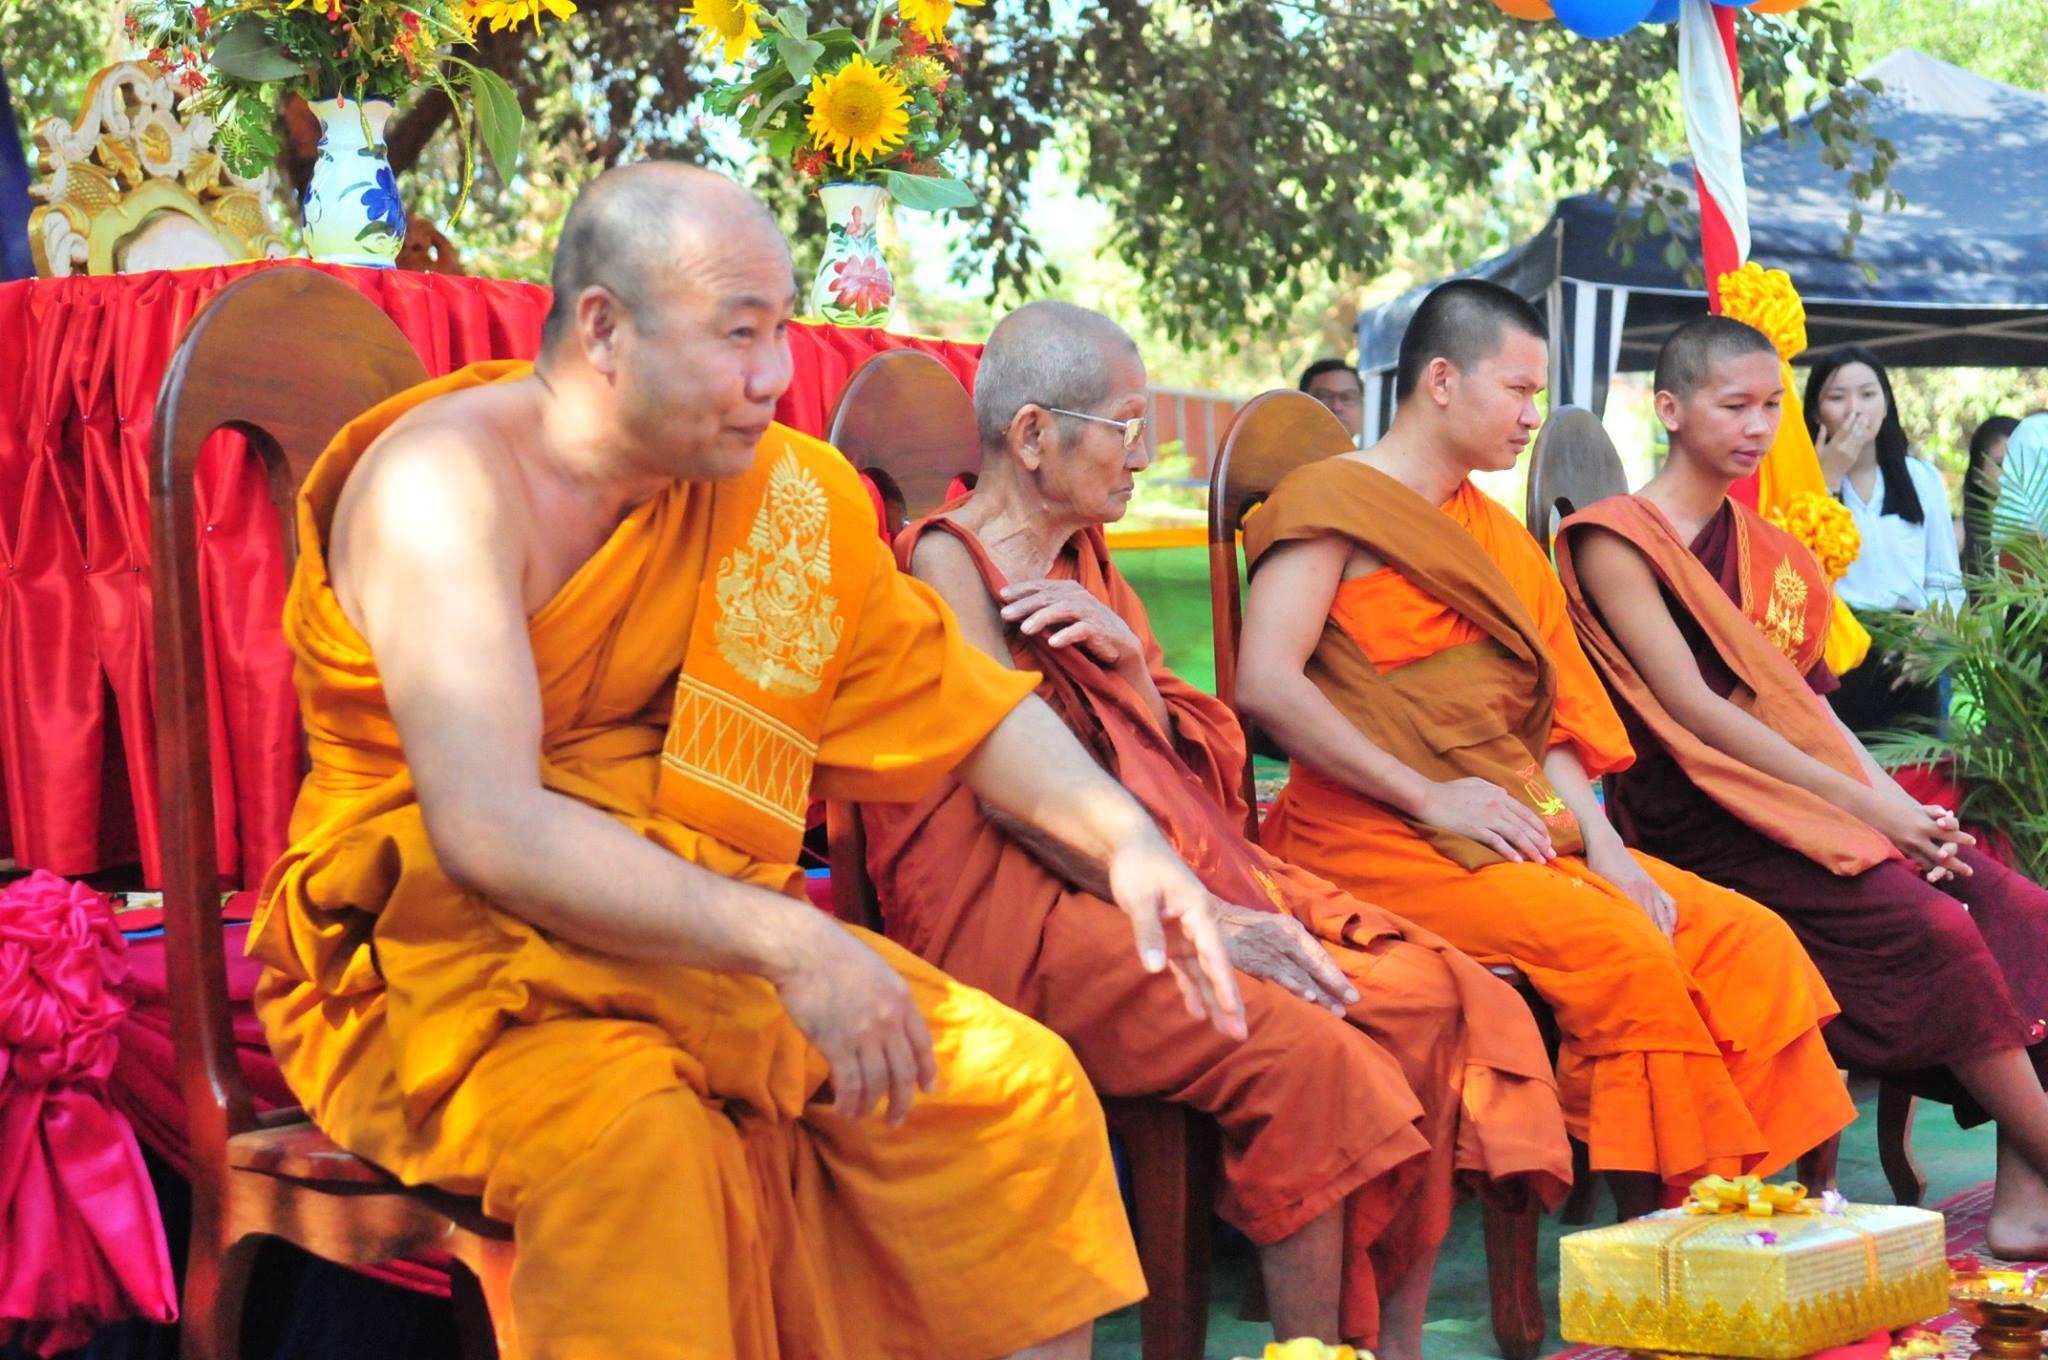 https://0901.nccdn.net/4_2/000/000/06b/a1b/cambodia15.jpg